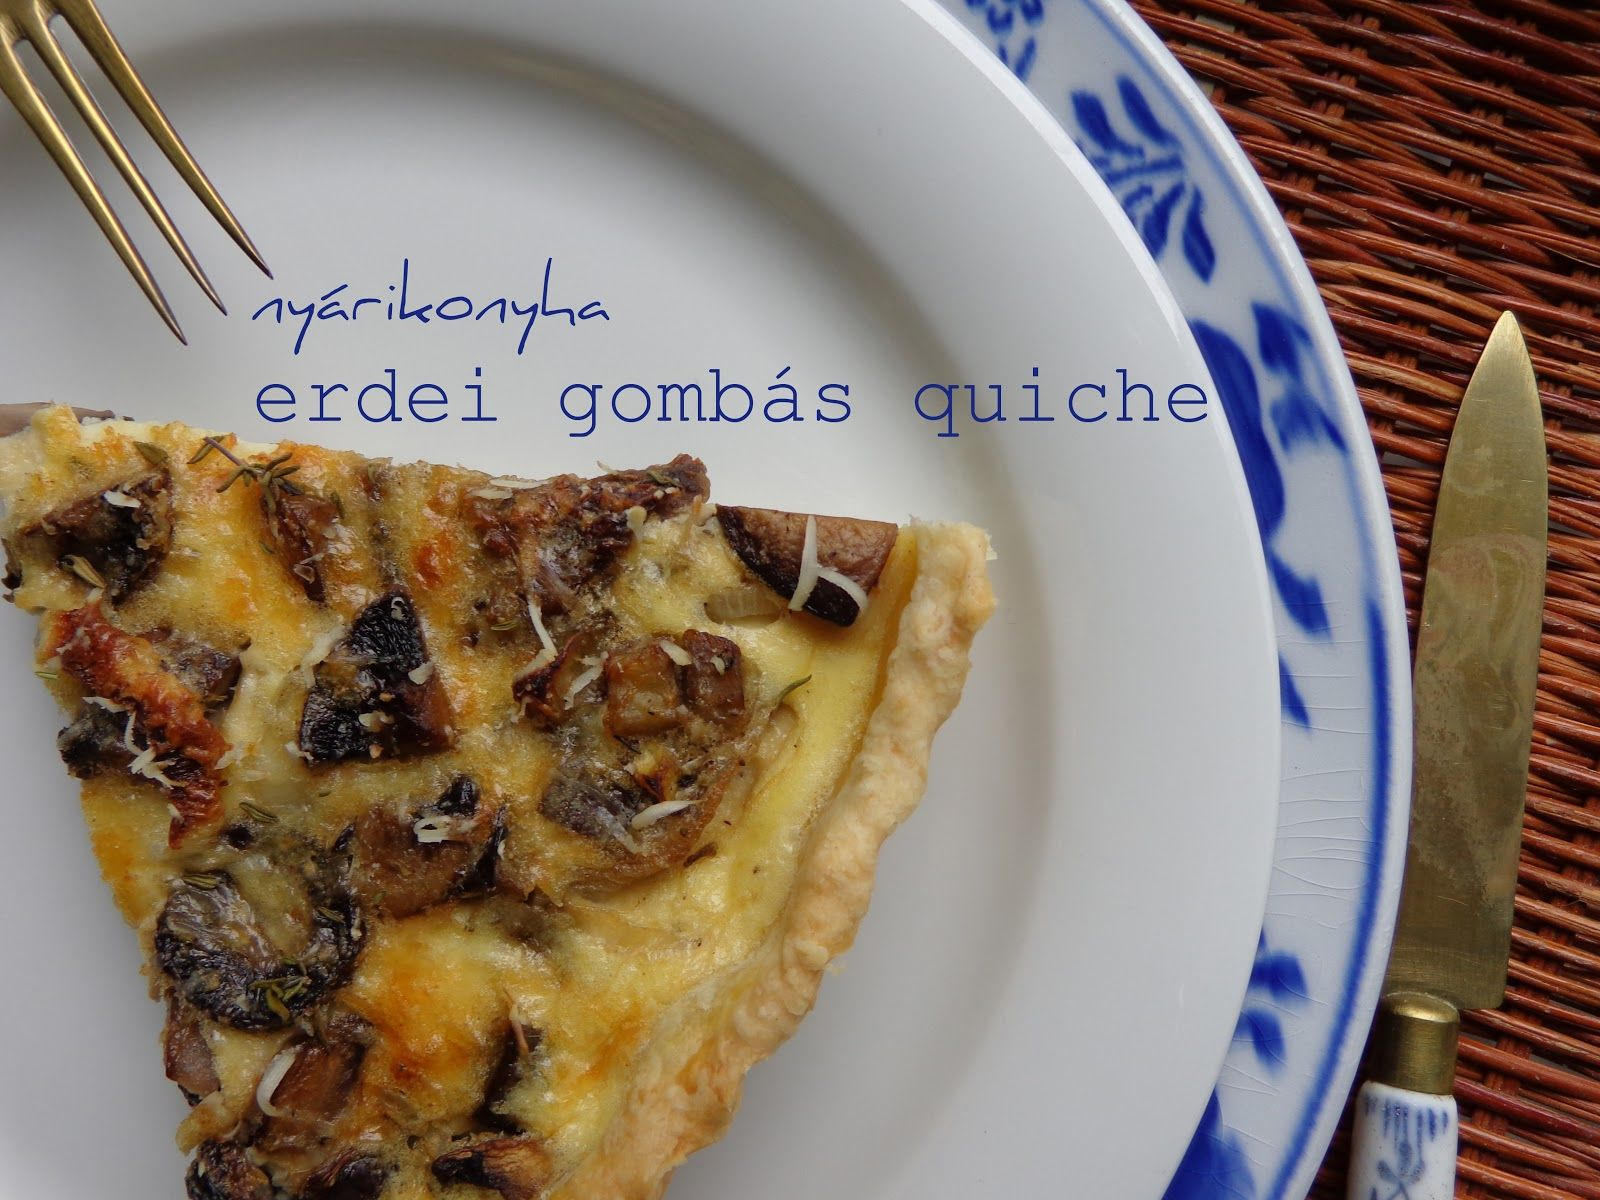 Gombás quiche - kipróbált quiche receptek képekkel - Receptvarázs – receptek képekkel